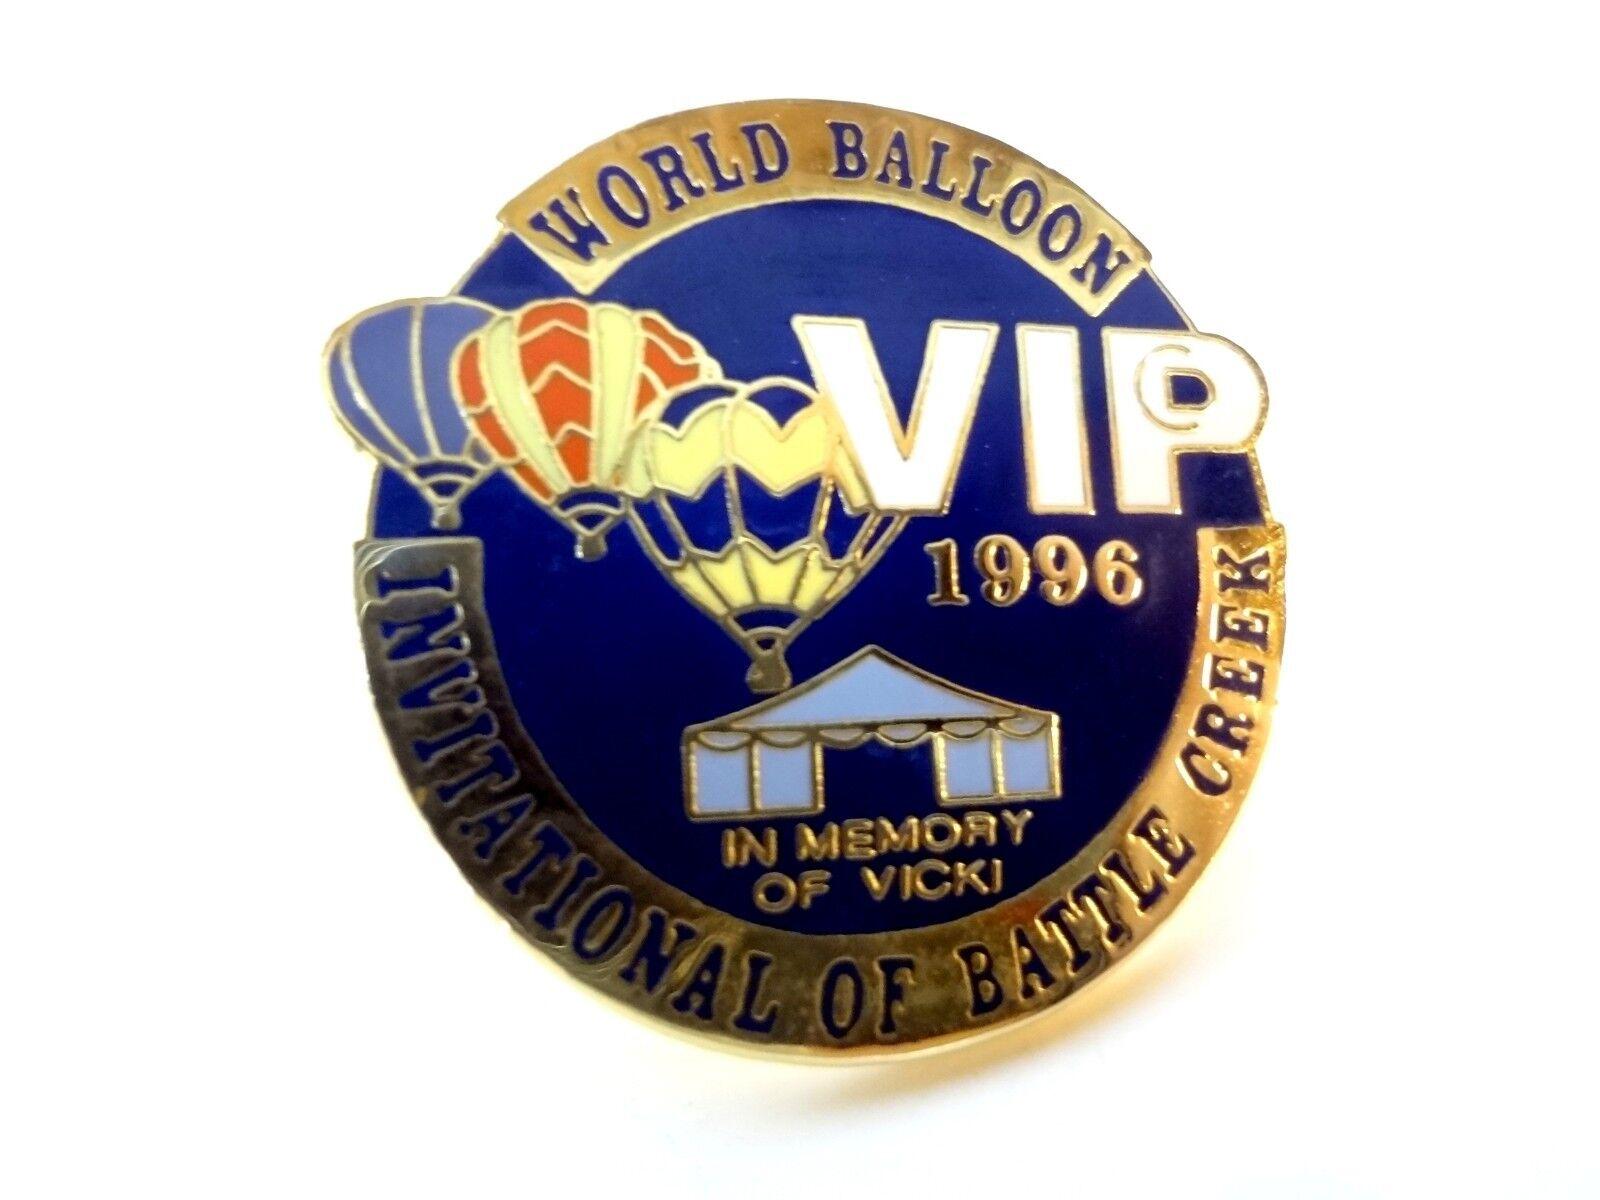 World Balloon Race Invitational Battle Creek Michigan 1996 VIP Lapel Hat Pin Tie